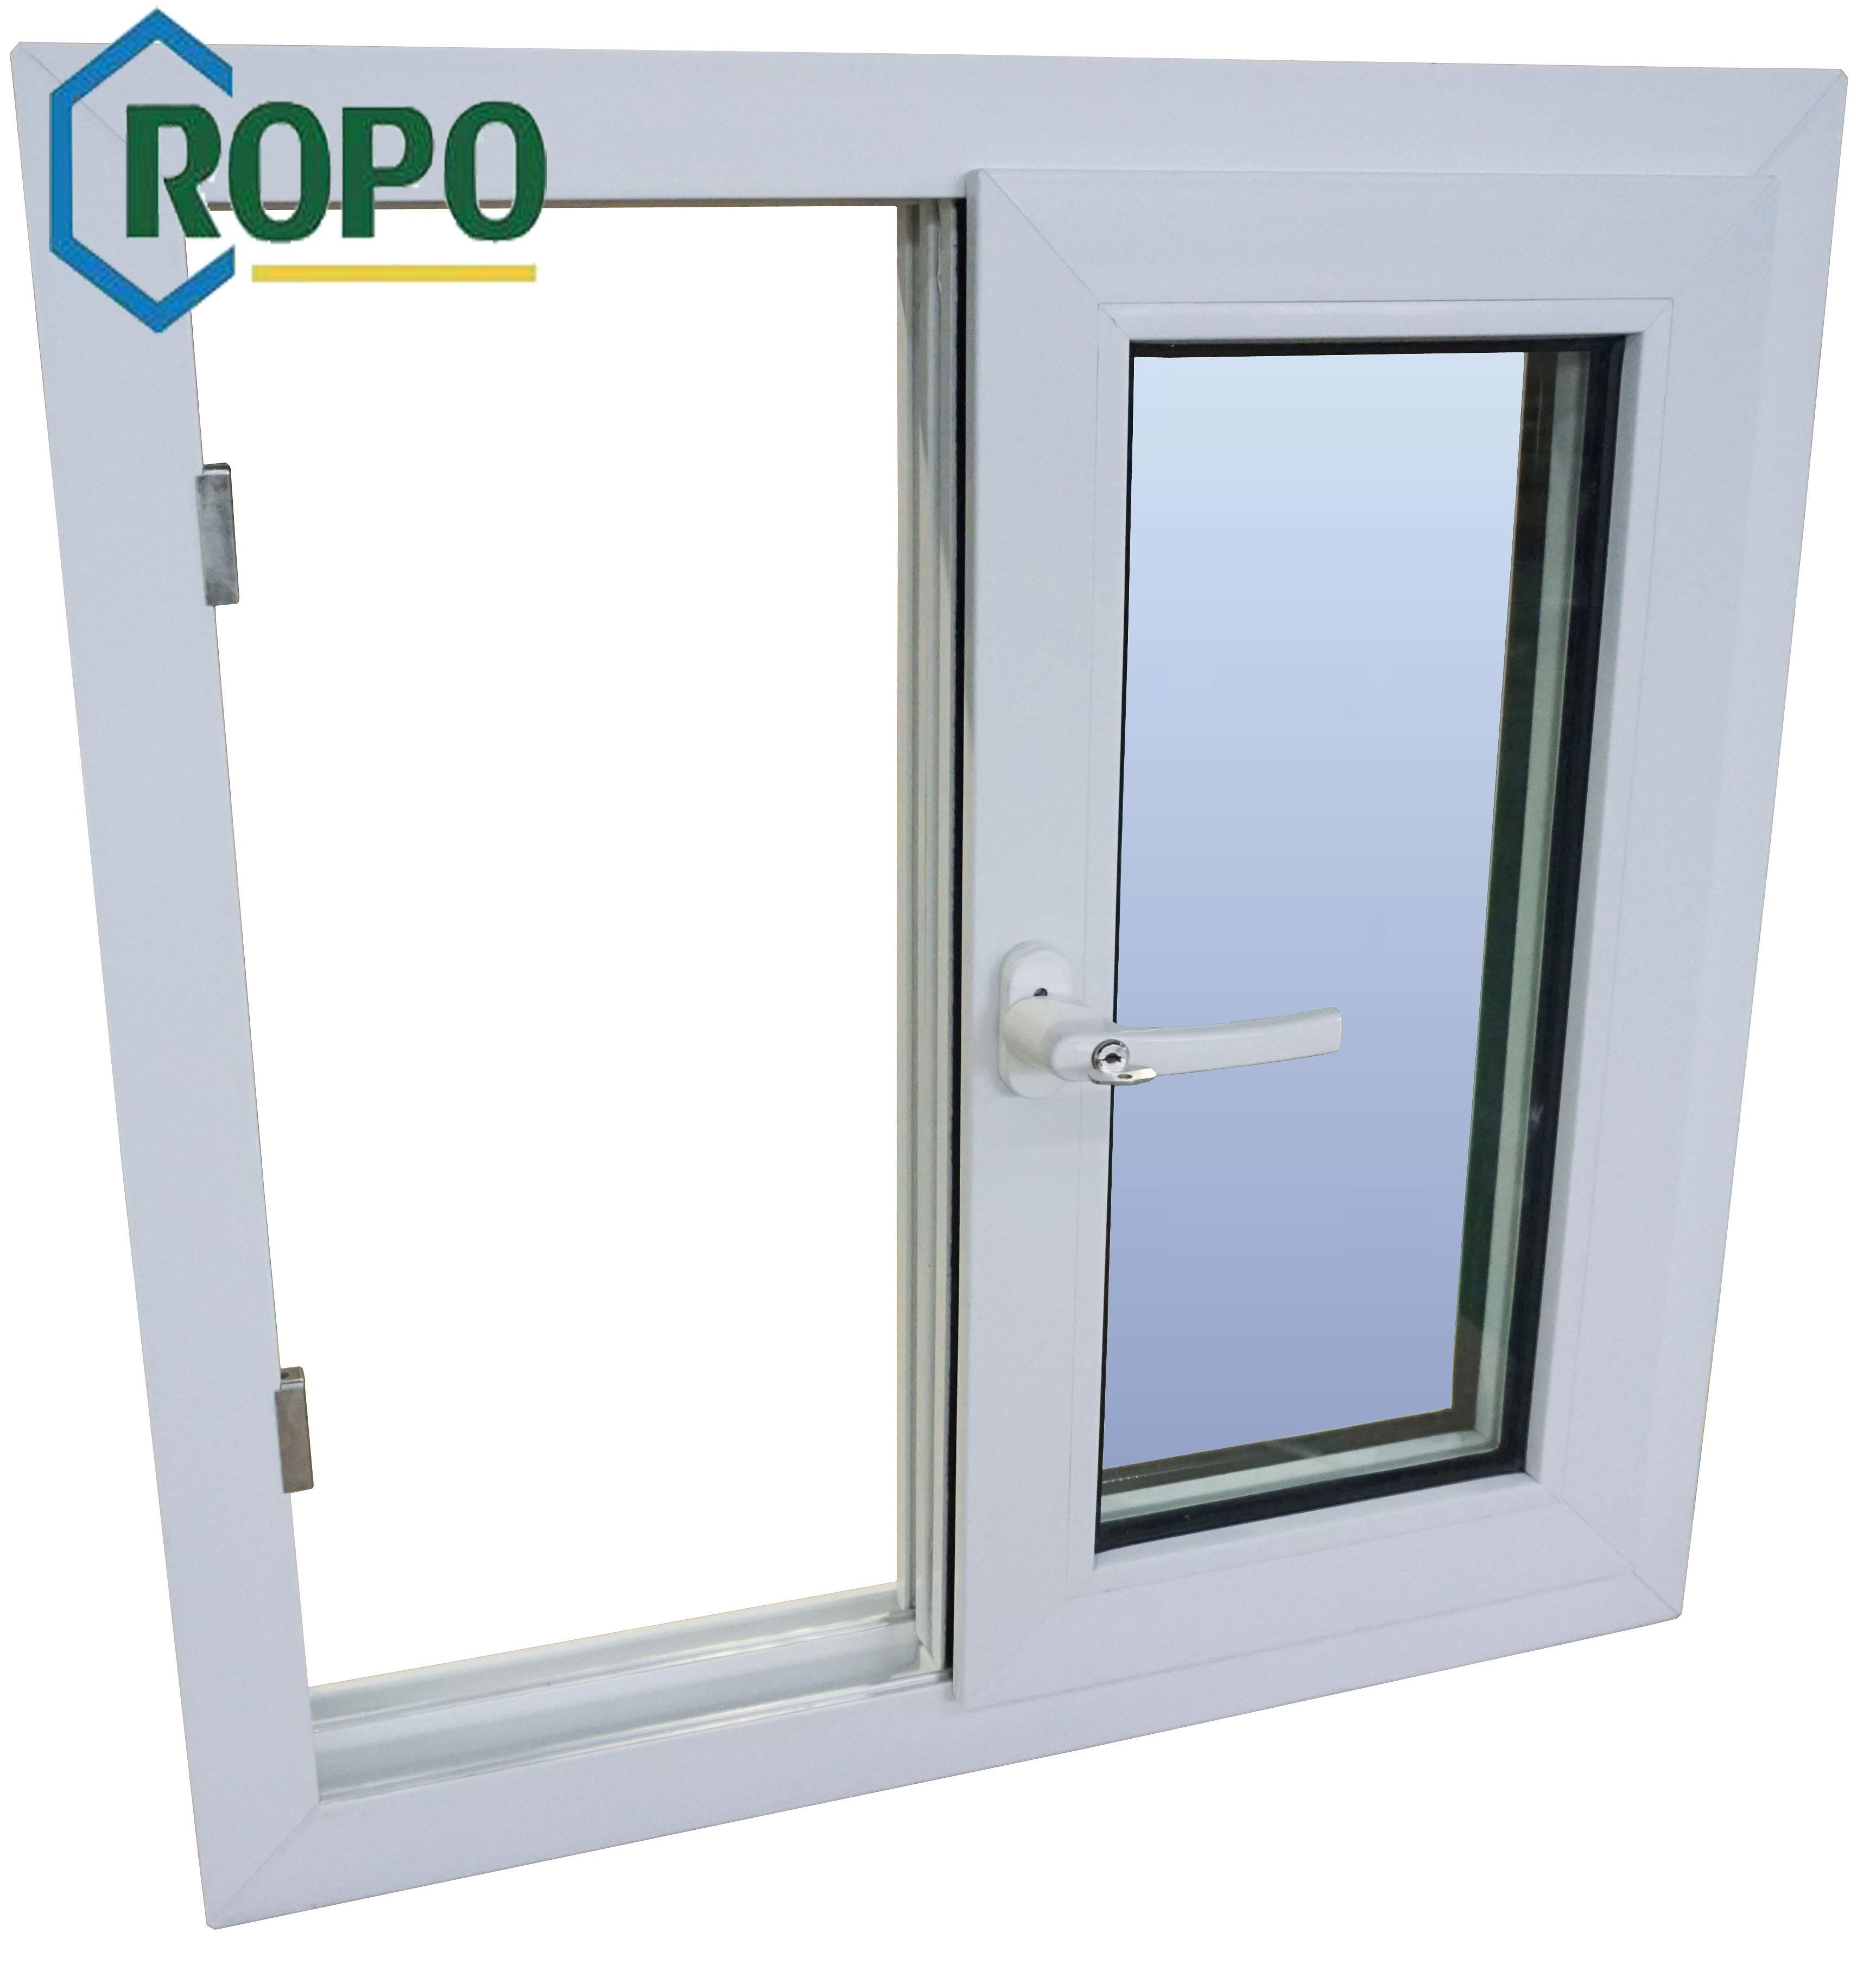 reputable site 08947 e0b8e [Hot Item] PVC Double Glazed Insulated Slide Glass Windows